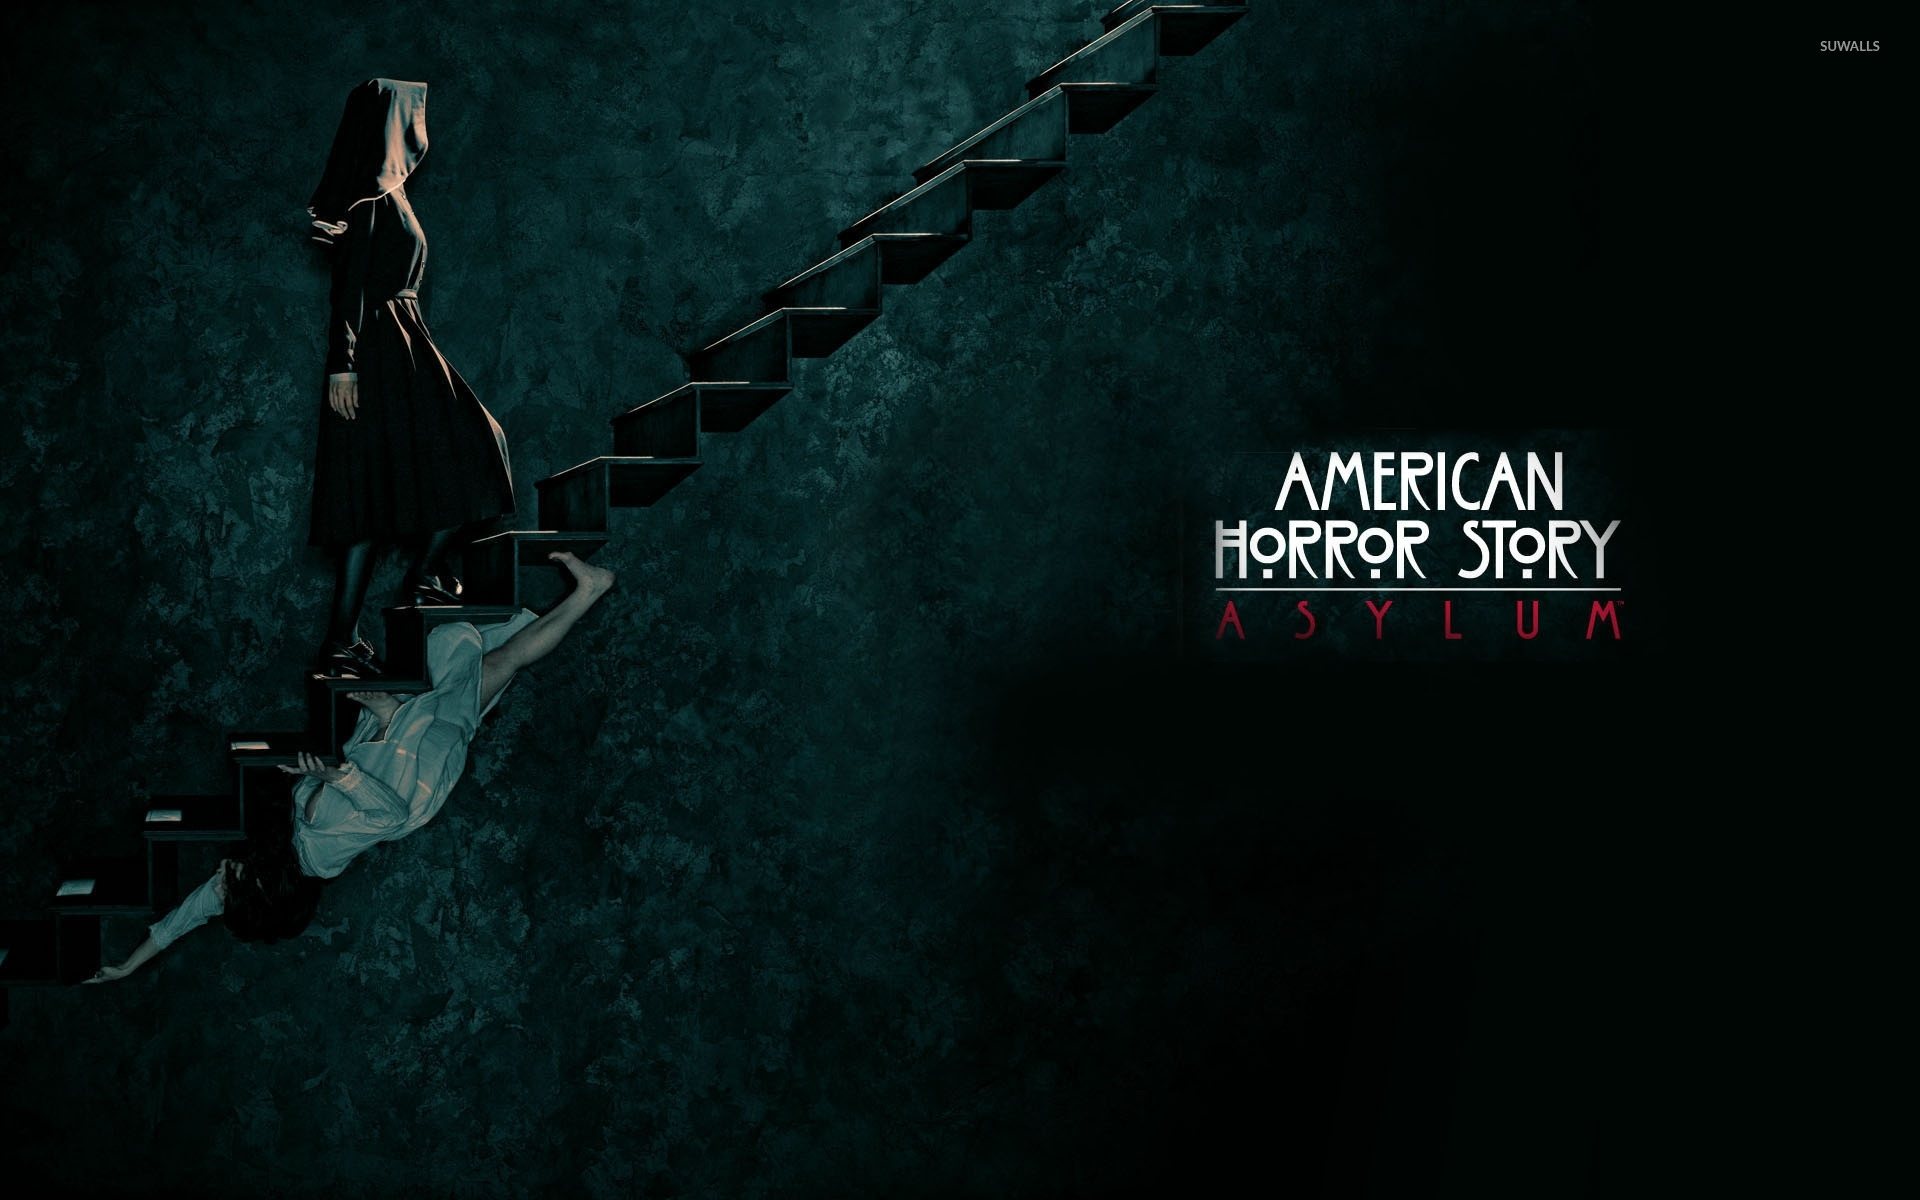 american horror story - asylum [2] wallpaper - tv show wallpapers